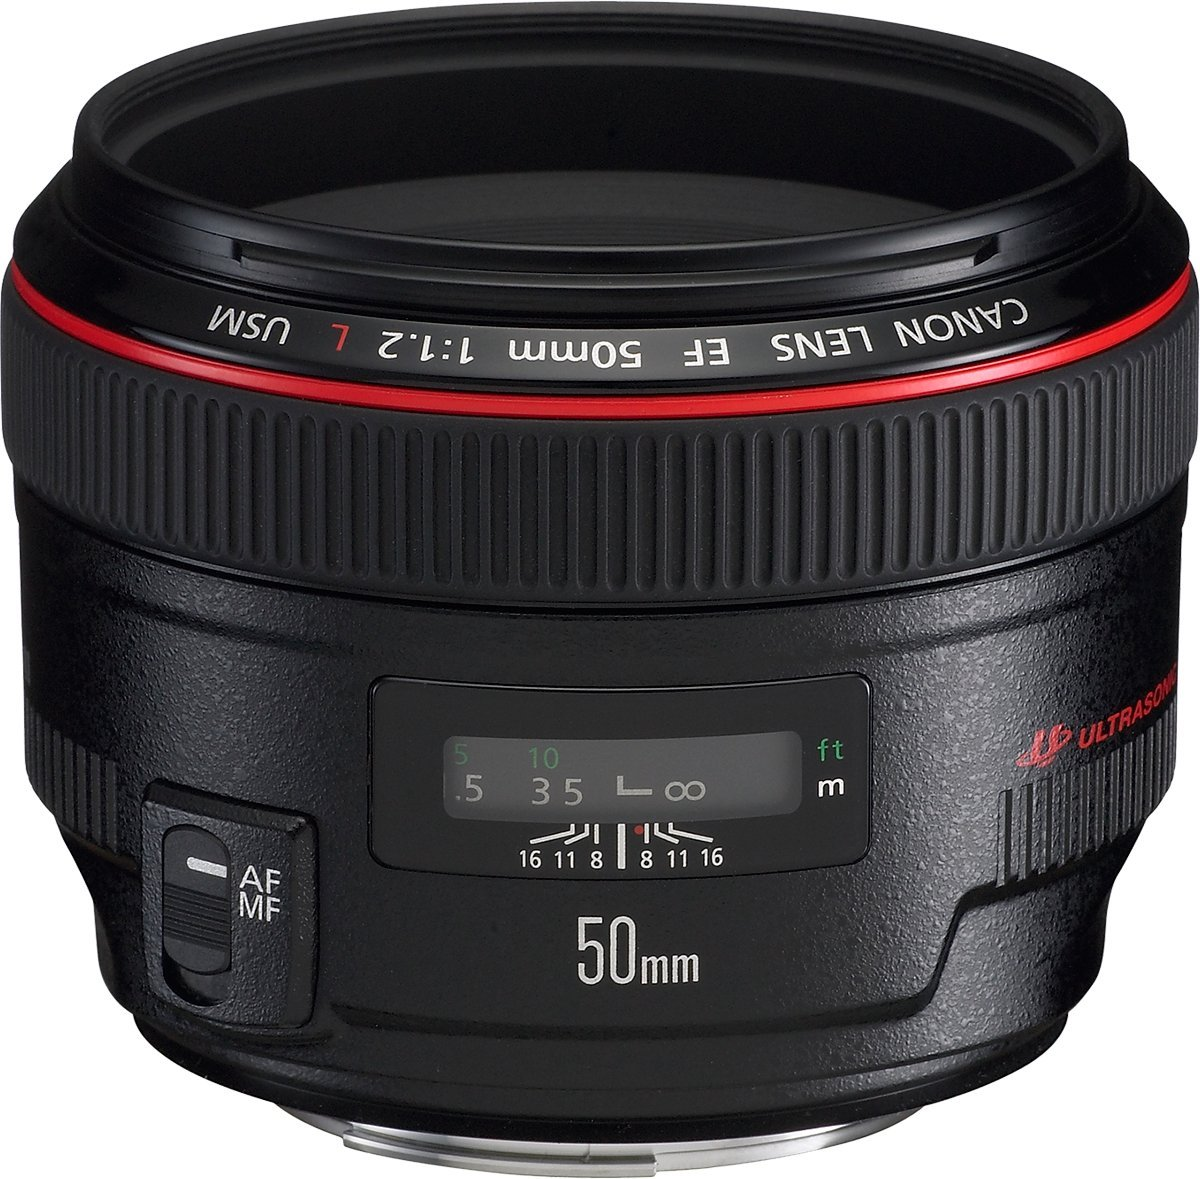 Canon EF mm f L USM Objetivo para Canon distancia focal fija